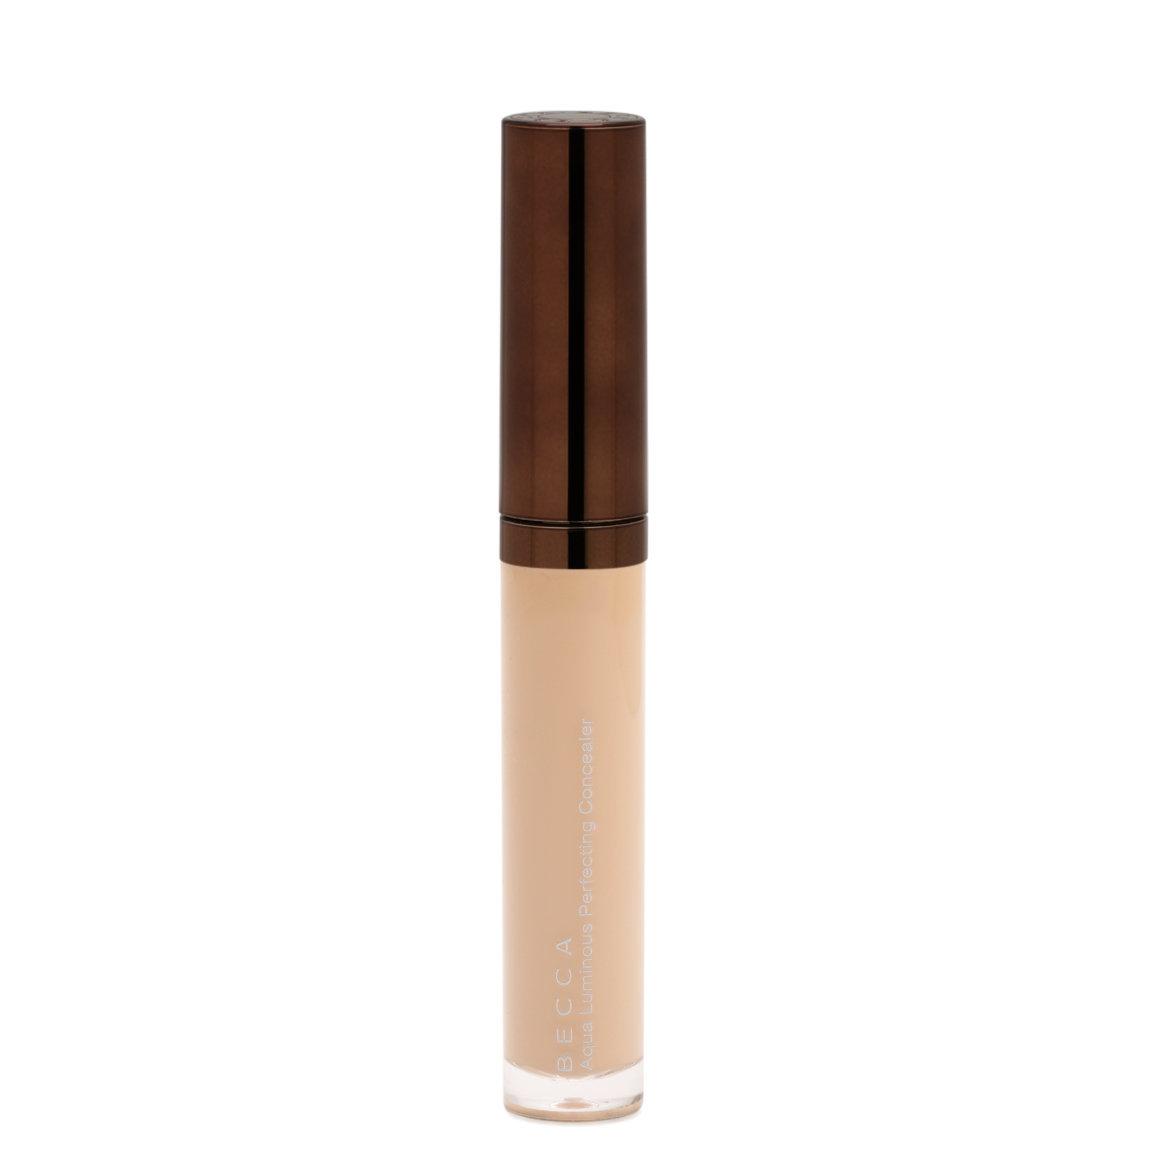 BECCA Cosmetics Aqua Luminous Perfecting Concealer Tan alternative view 1.